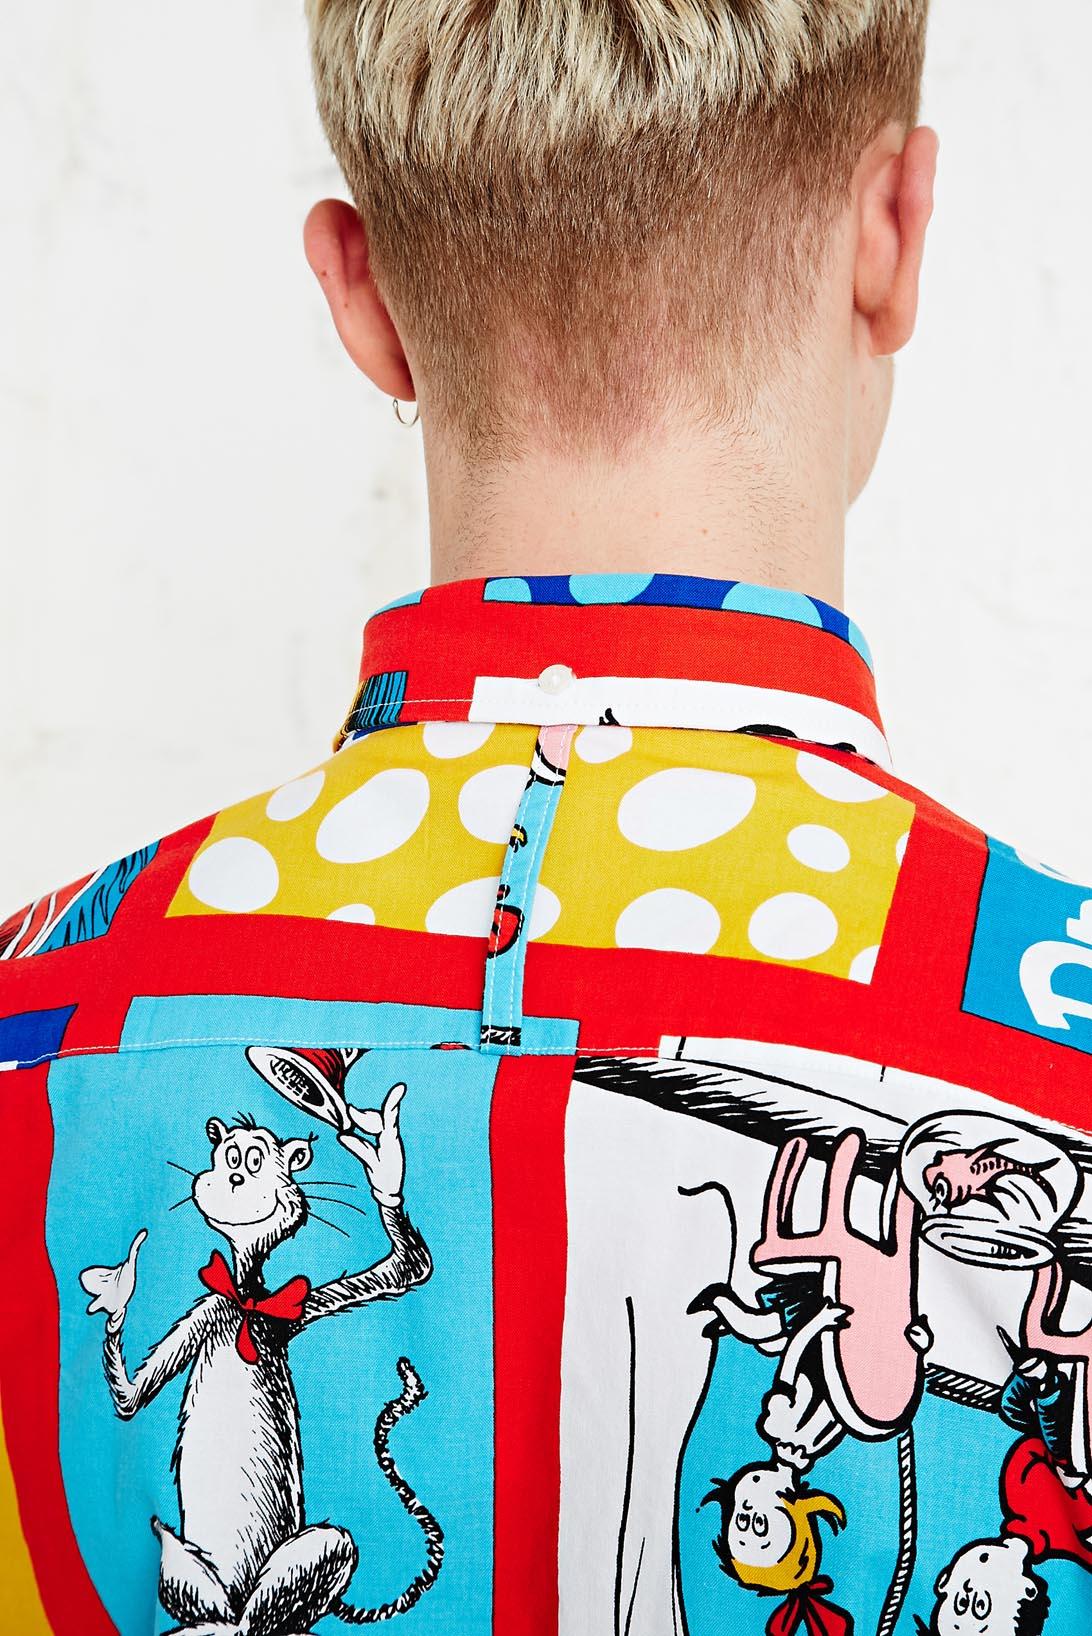 Urban outfitters an honourable shirt portrait of a cat for Lucky cat shirt urban outfitters